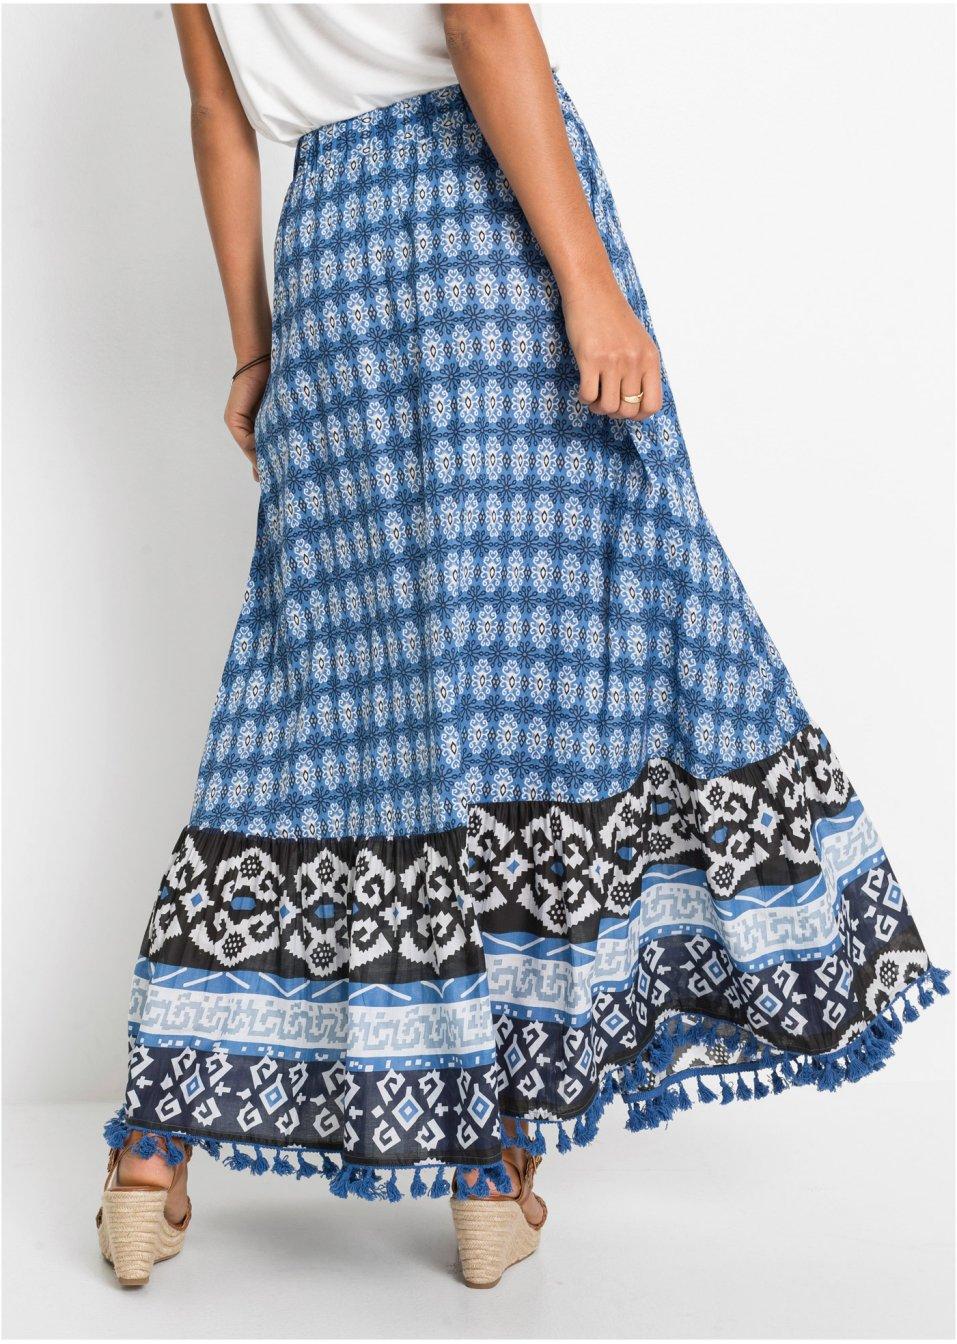 Mode Femme Vêtements DJLfdOFlkj Jupe longue avec pompons bleu cristal à motif Femme BODYFLIRT .fr